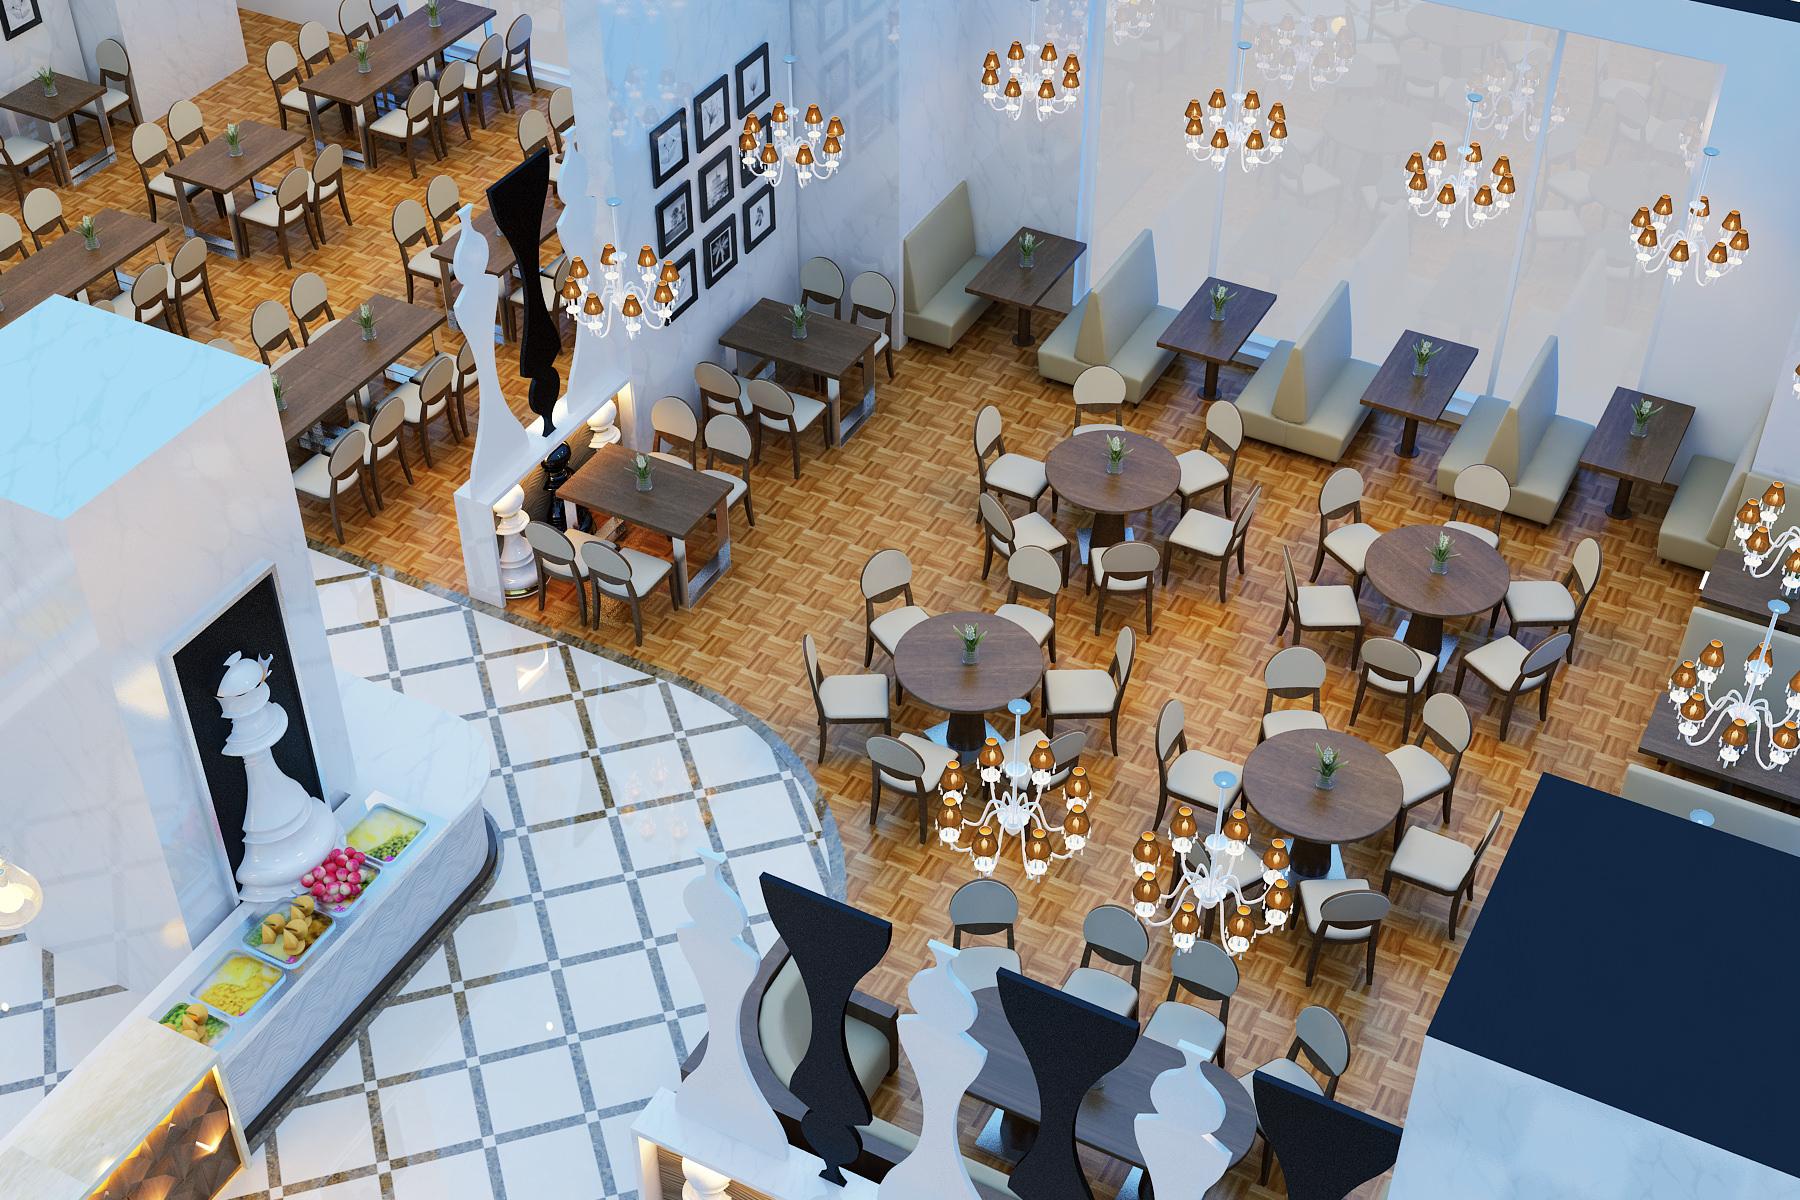 chair design restaurant bride and groom 3d models chess model max fbx | cgtrader.com